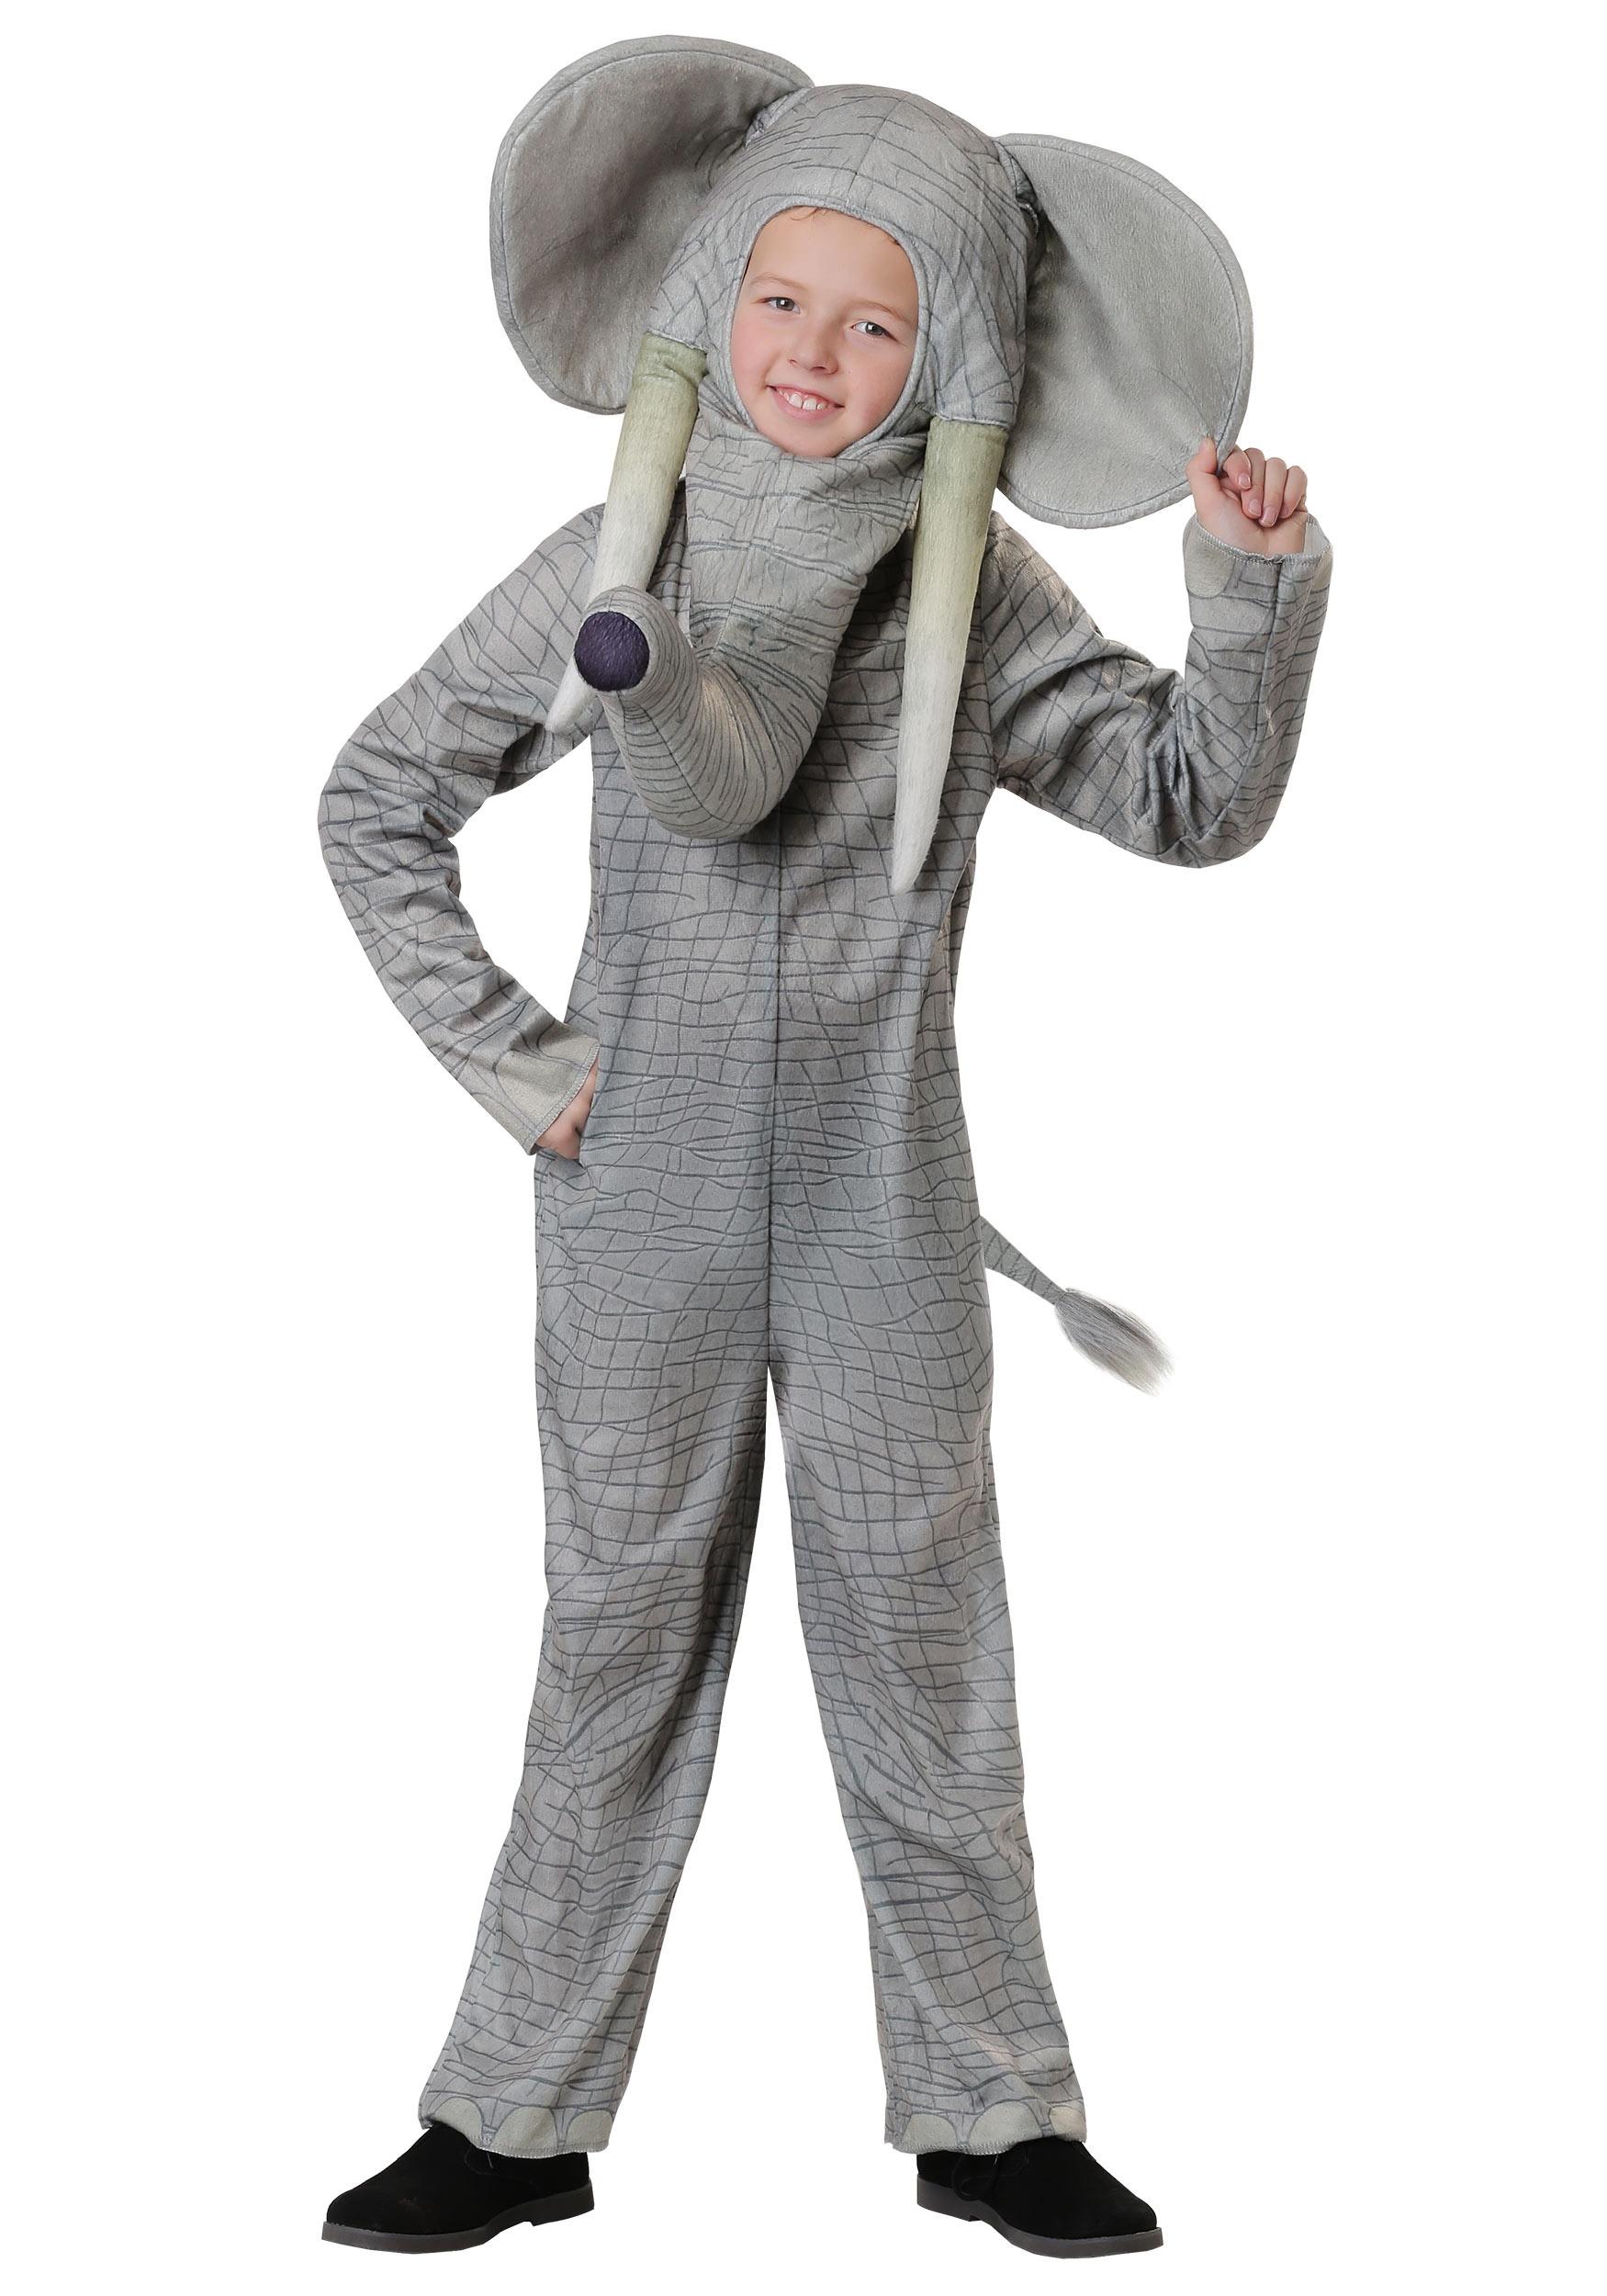 Kids Realistic Elephant Costume  sc 1 st  Halloween Costumes UK & Realistic Elephant Costume for Kids